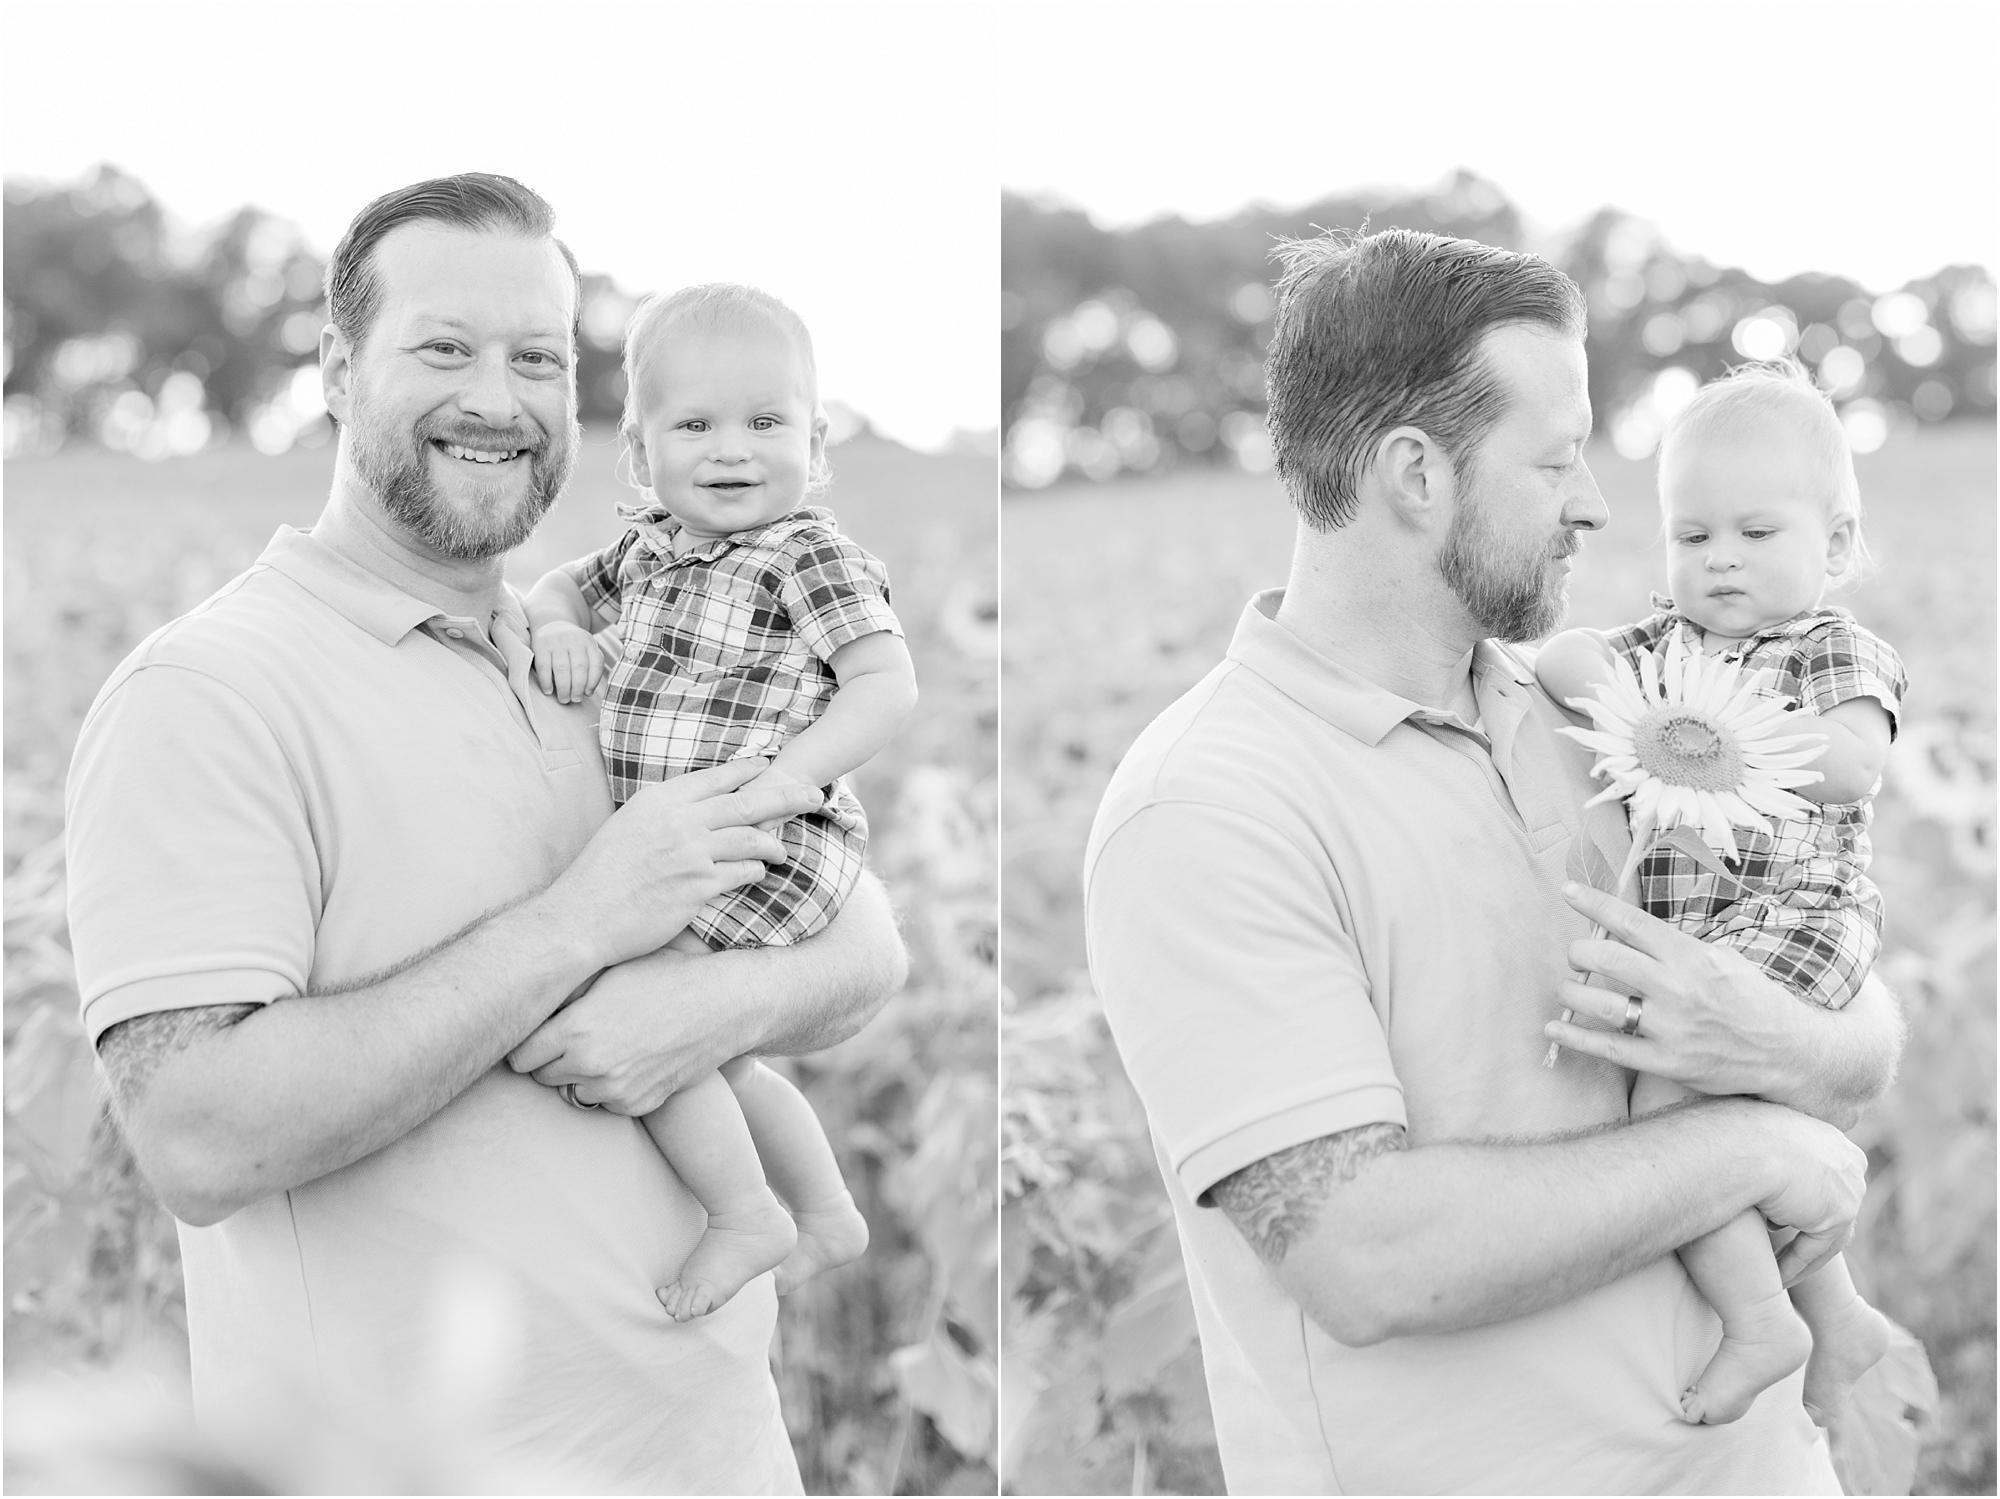 Andrews Family 2016-237_anna grace photography baltimore maryland maternity family photographer sunflower field photo.jpg